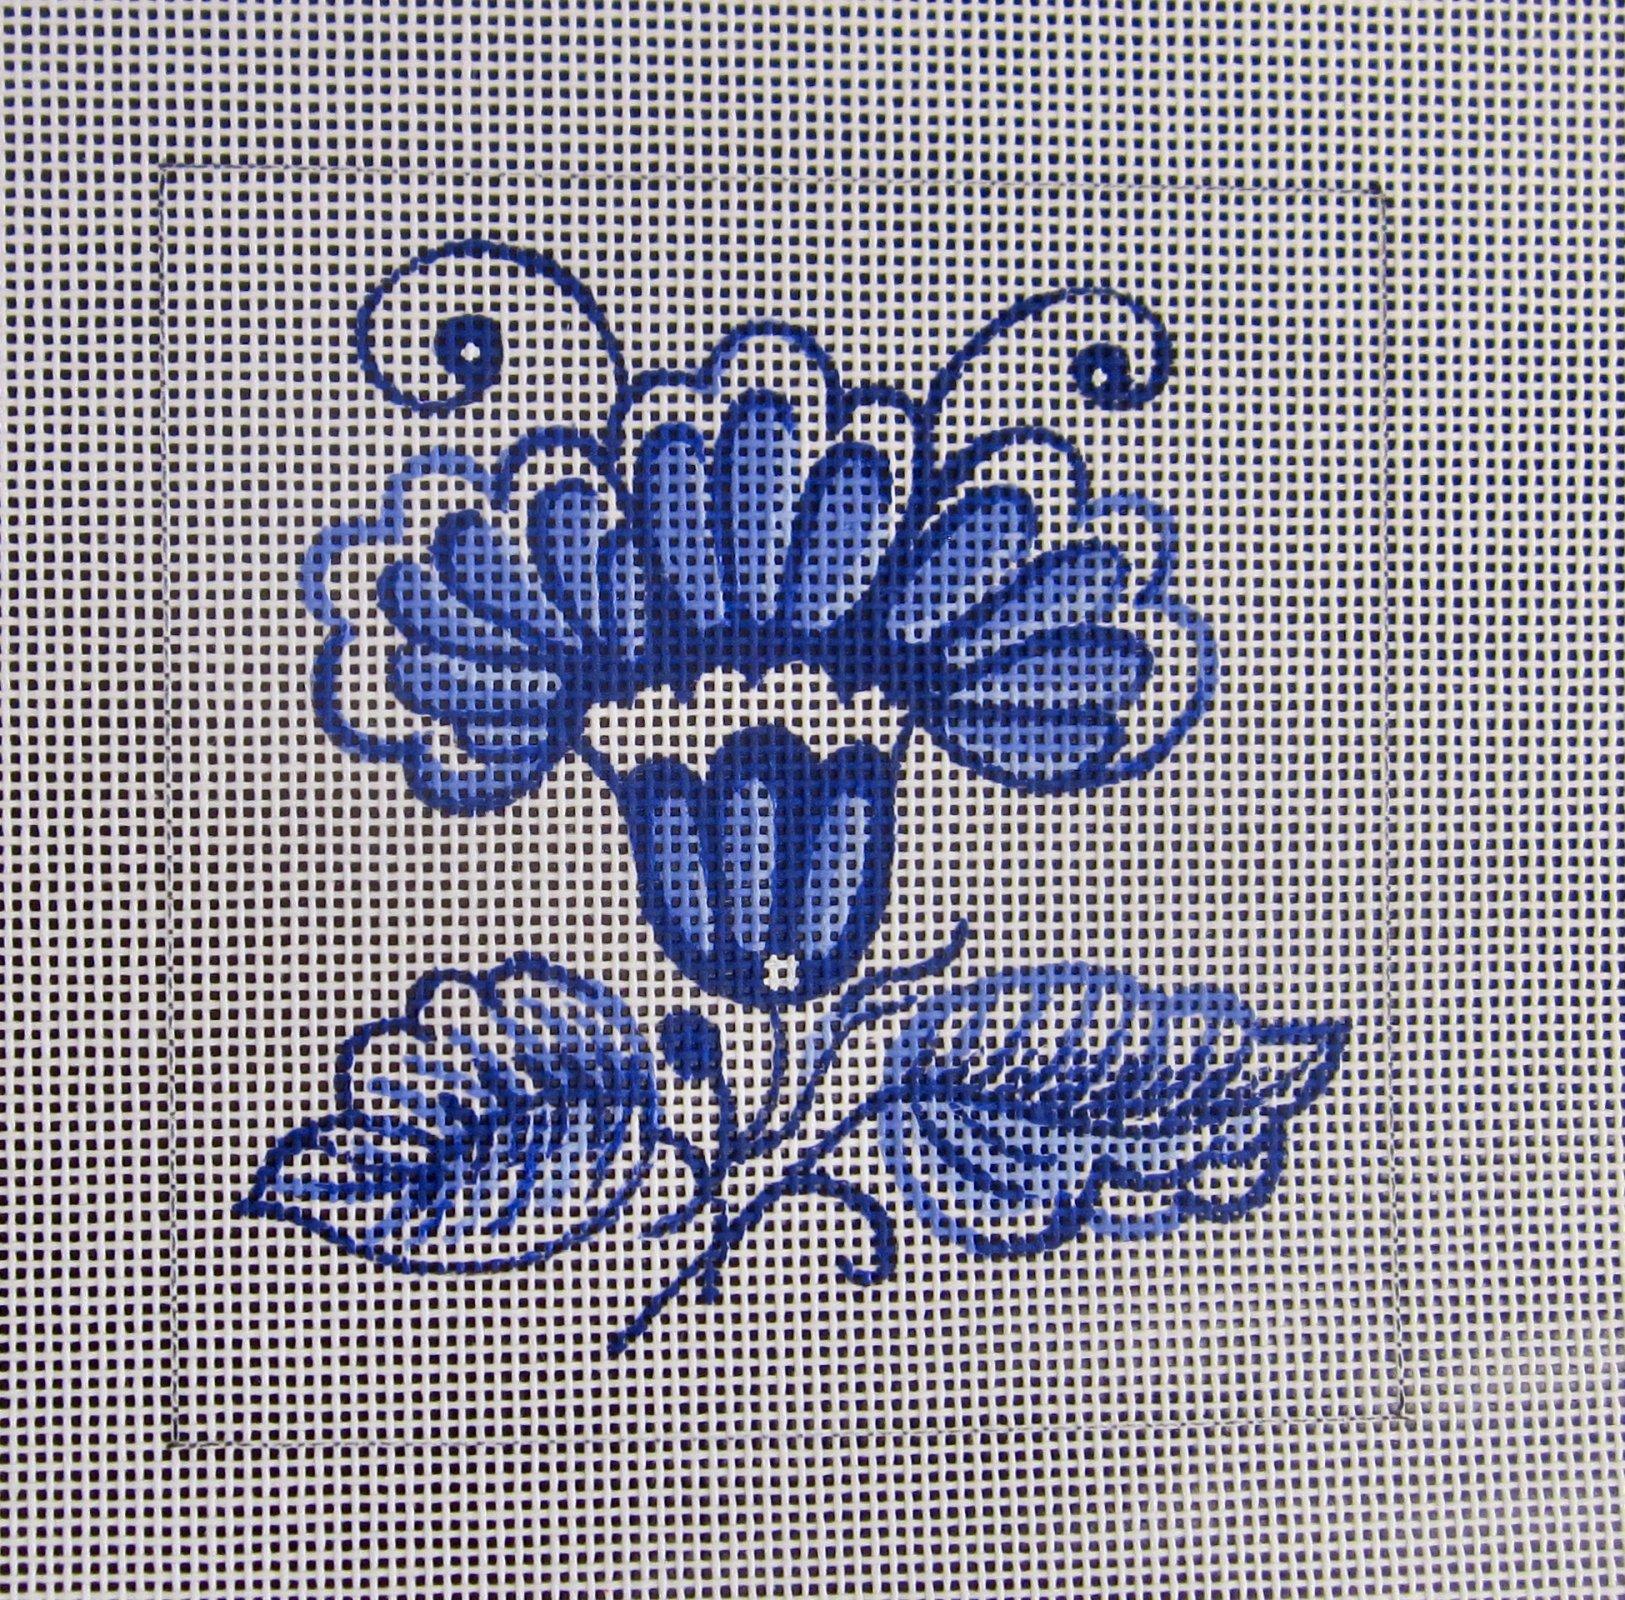 Delft Tiles - Iris